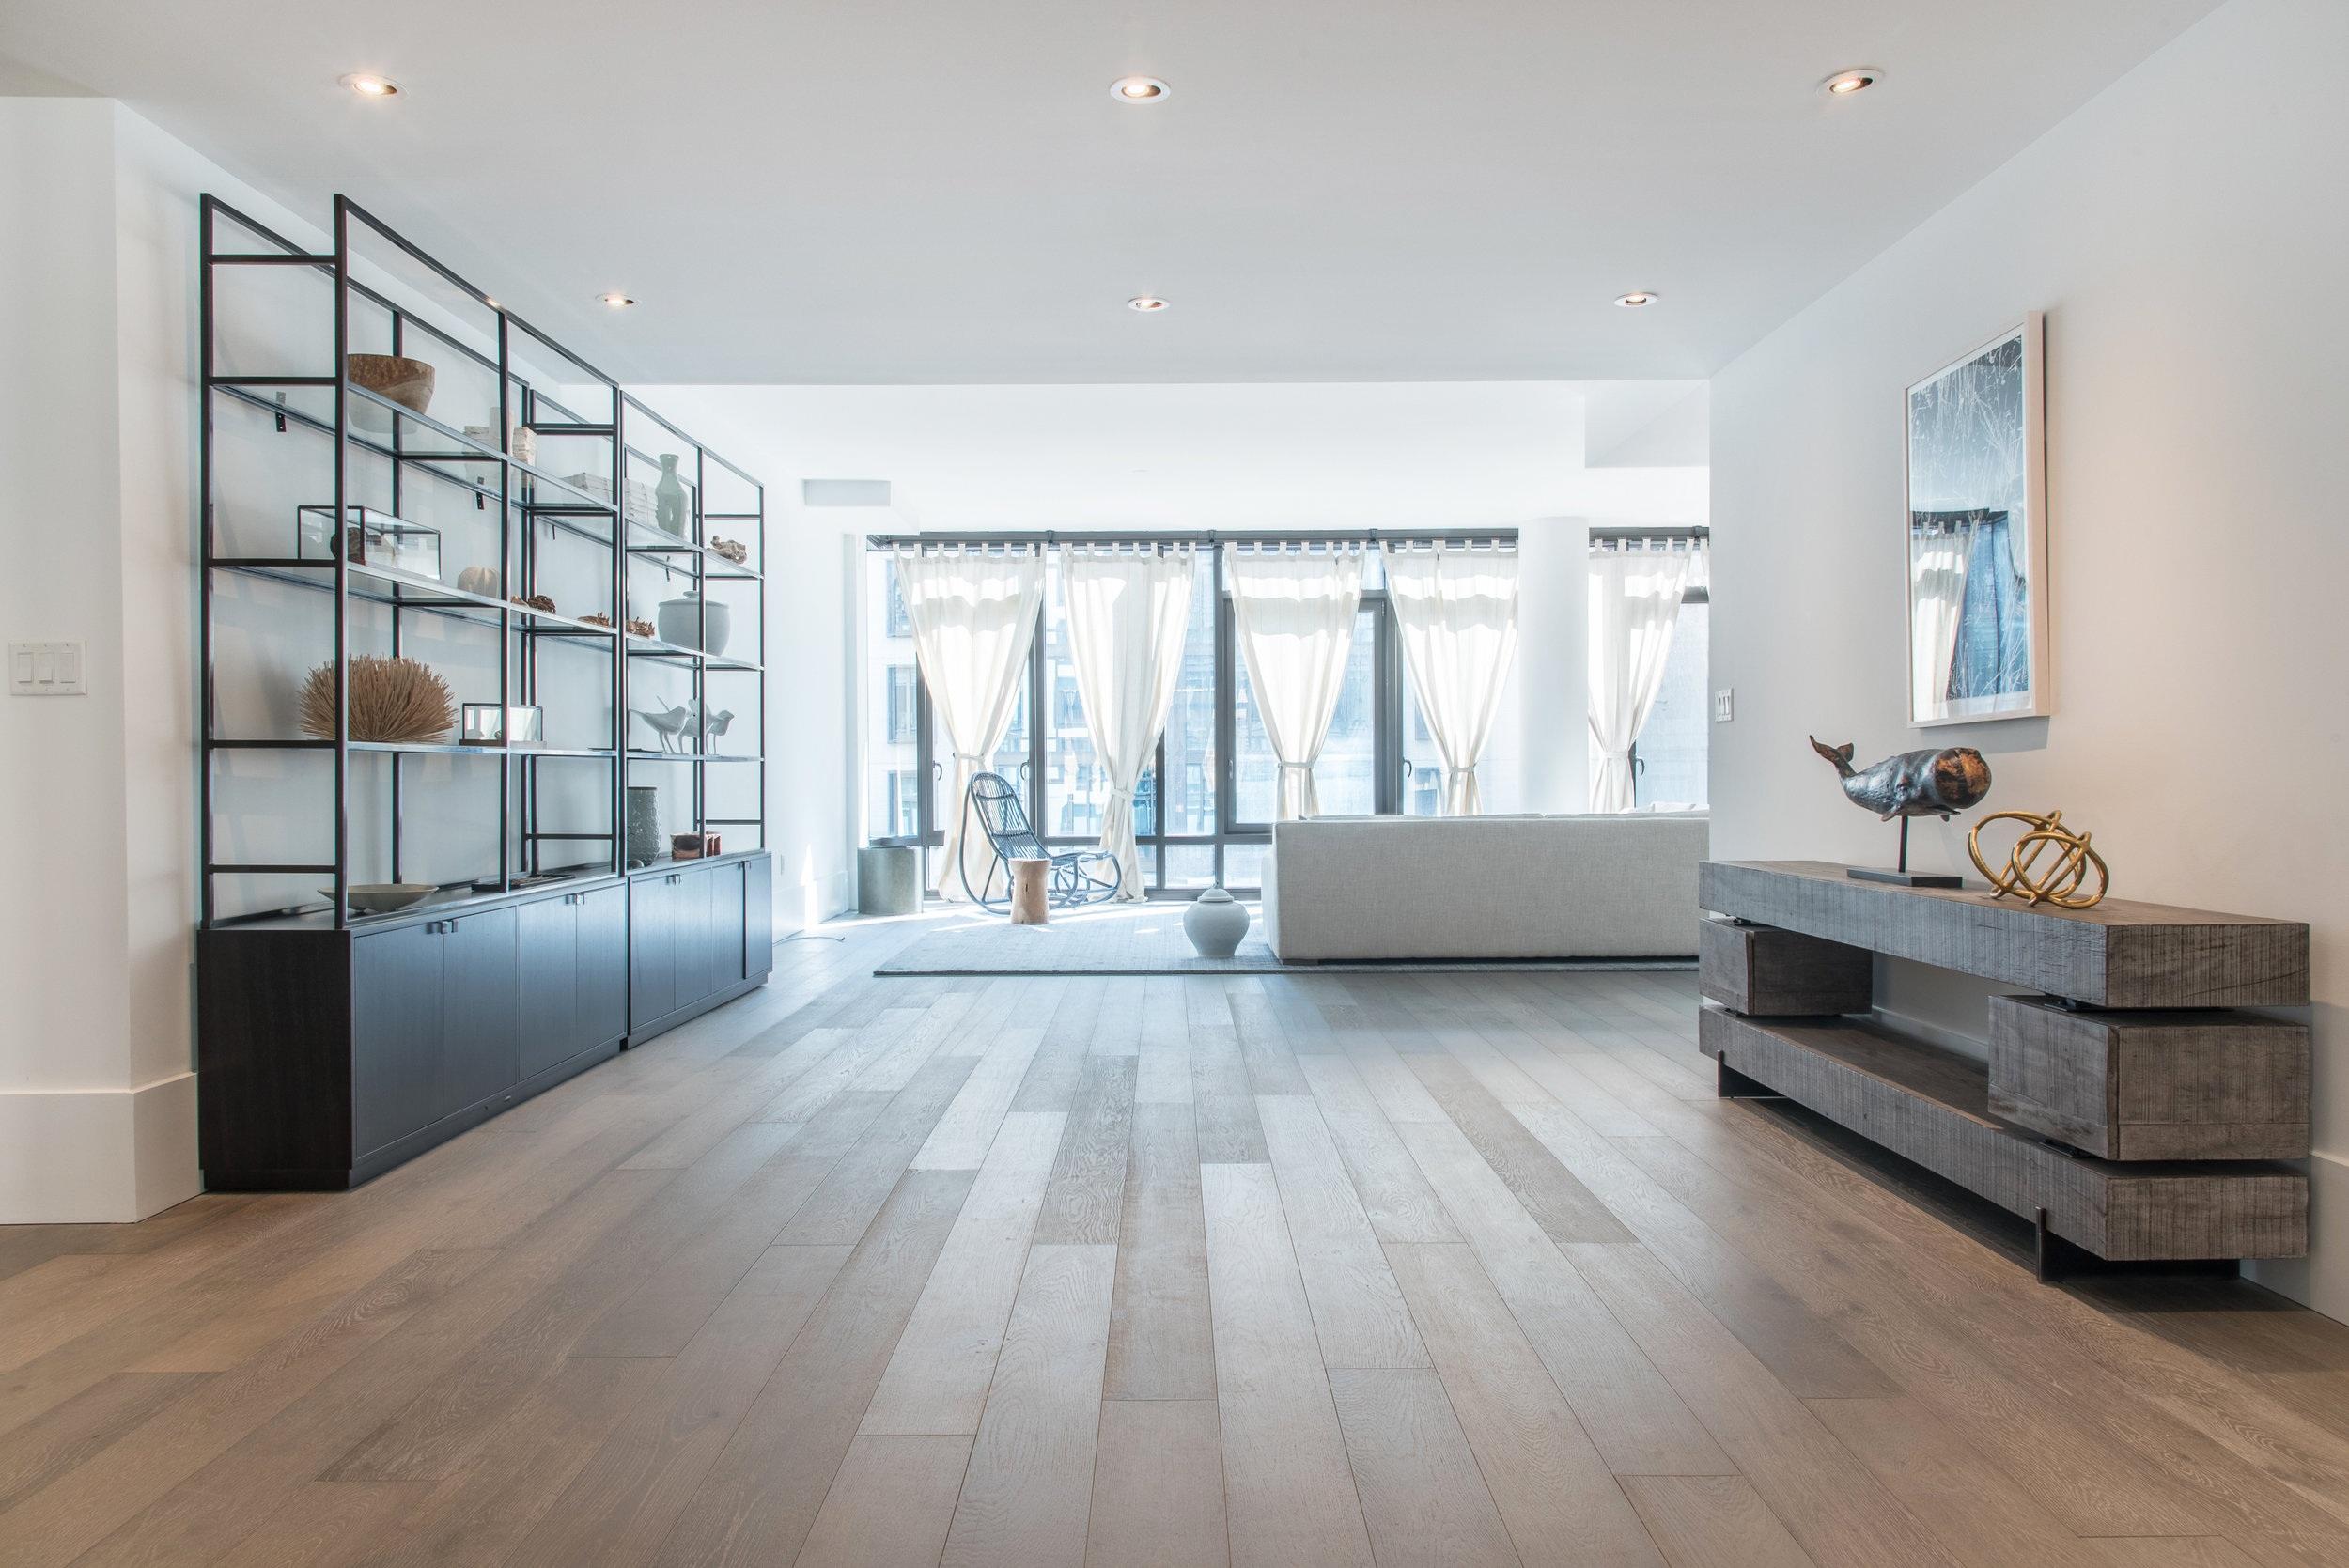 429 Kent Ave, L32 - Williamsburg | Brooklyn    3 Bedroom // 3 Bath Leased Price:    $14,500